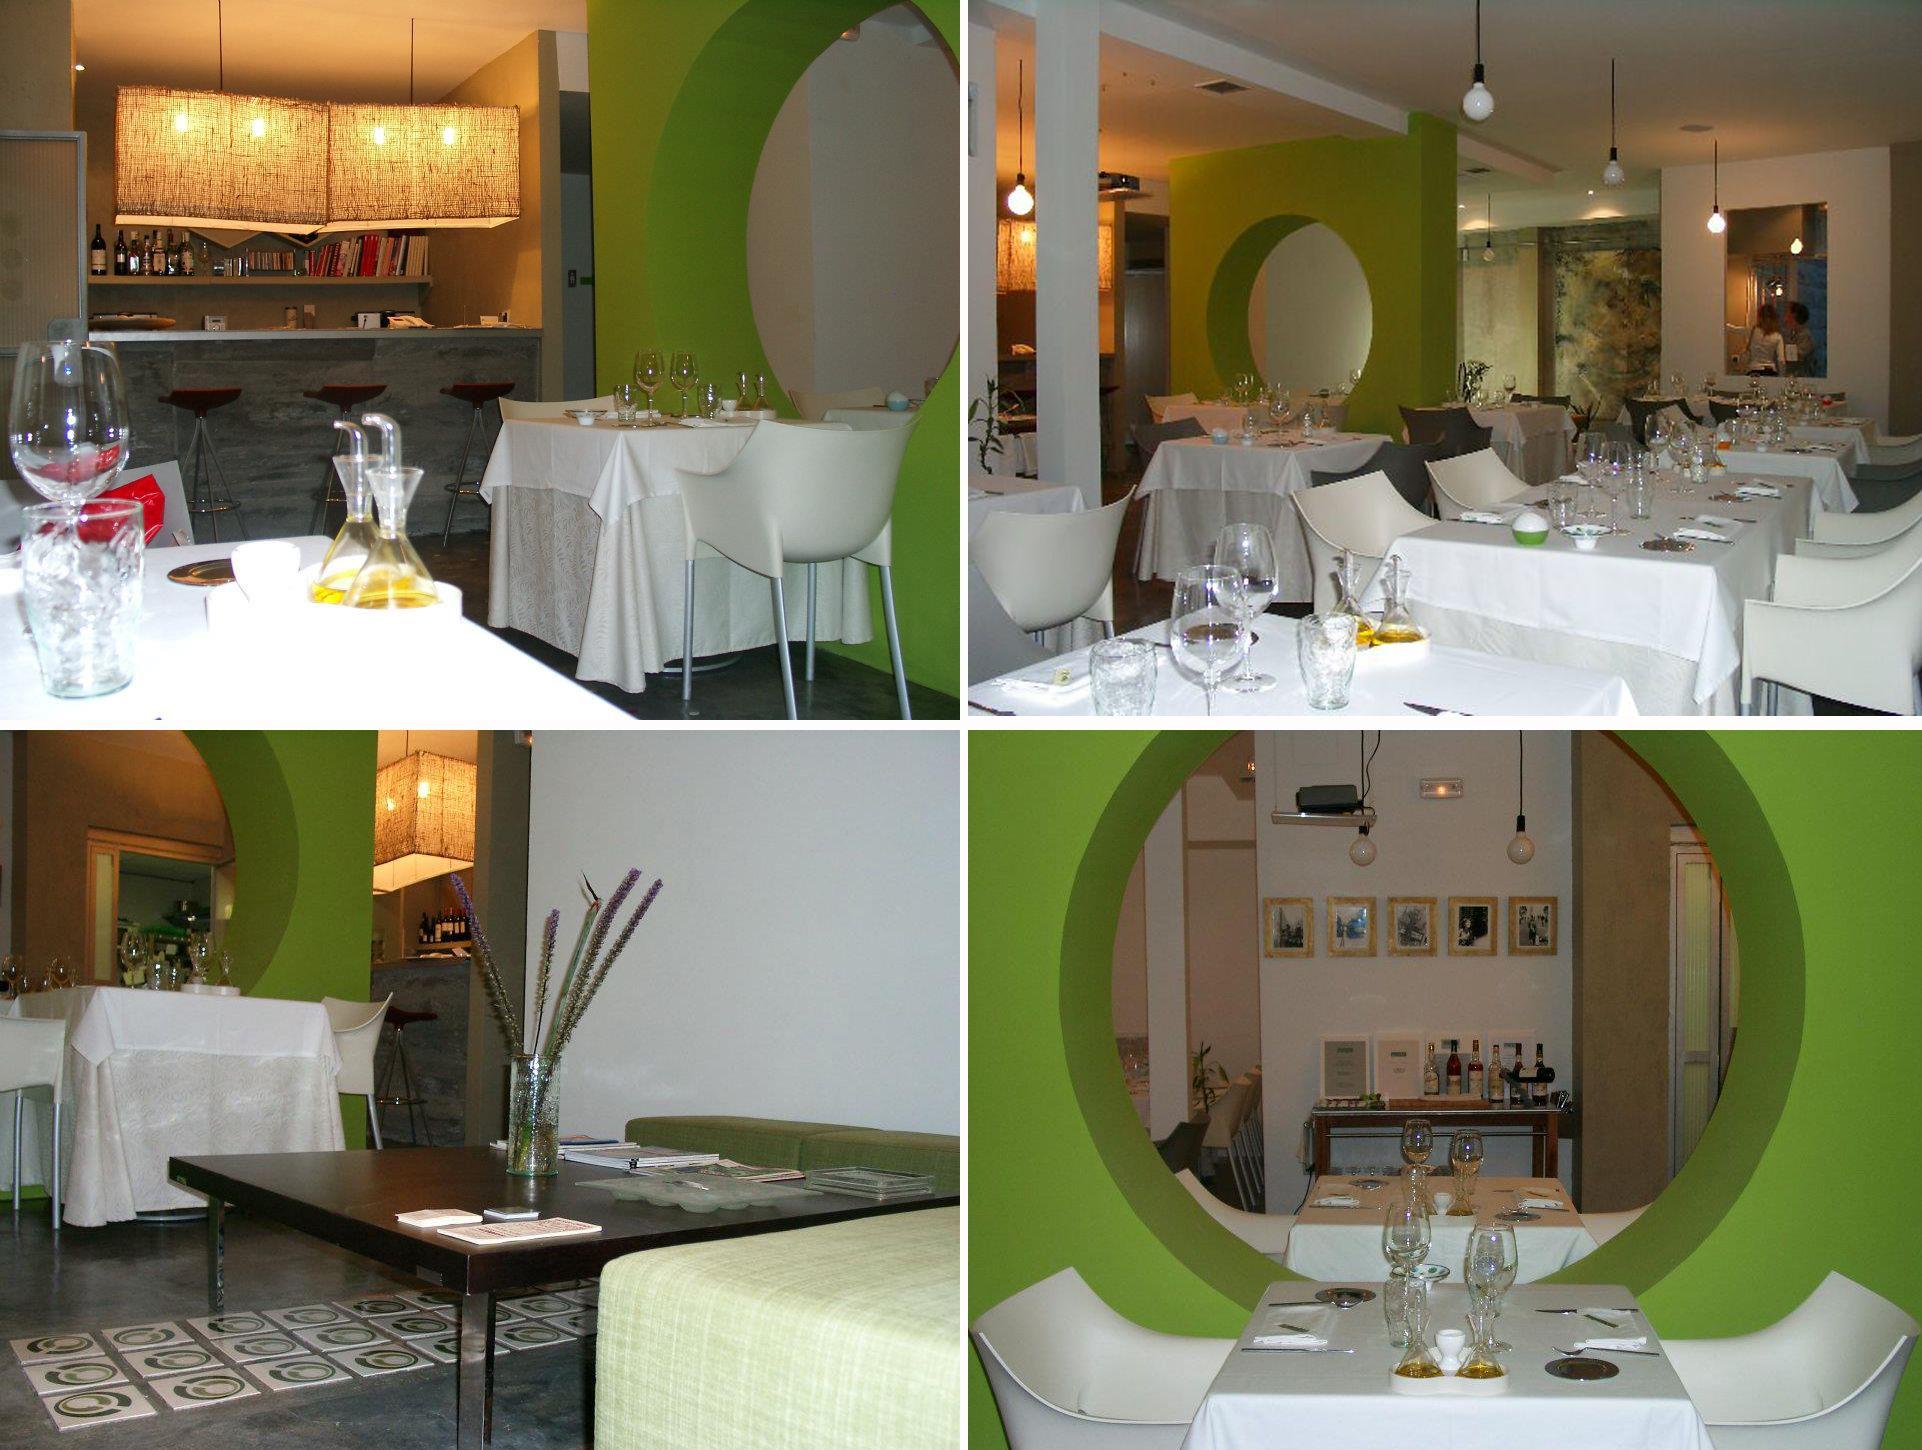 Ideas de decoracion de restaurante estilo moderno for Ideas decoracion restaurante